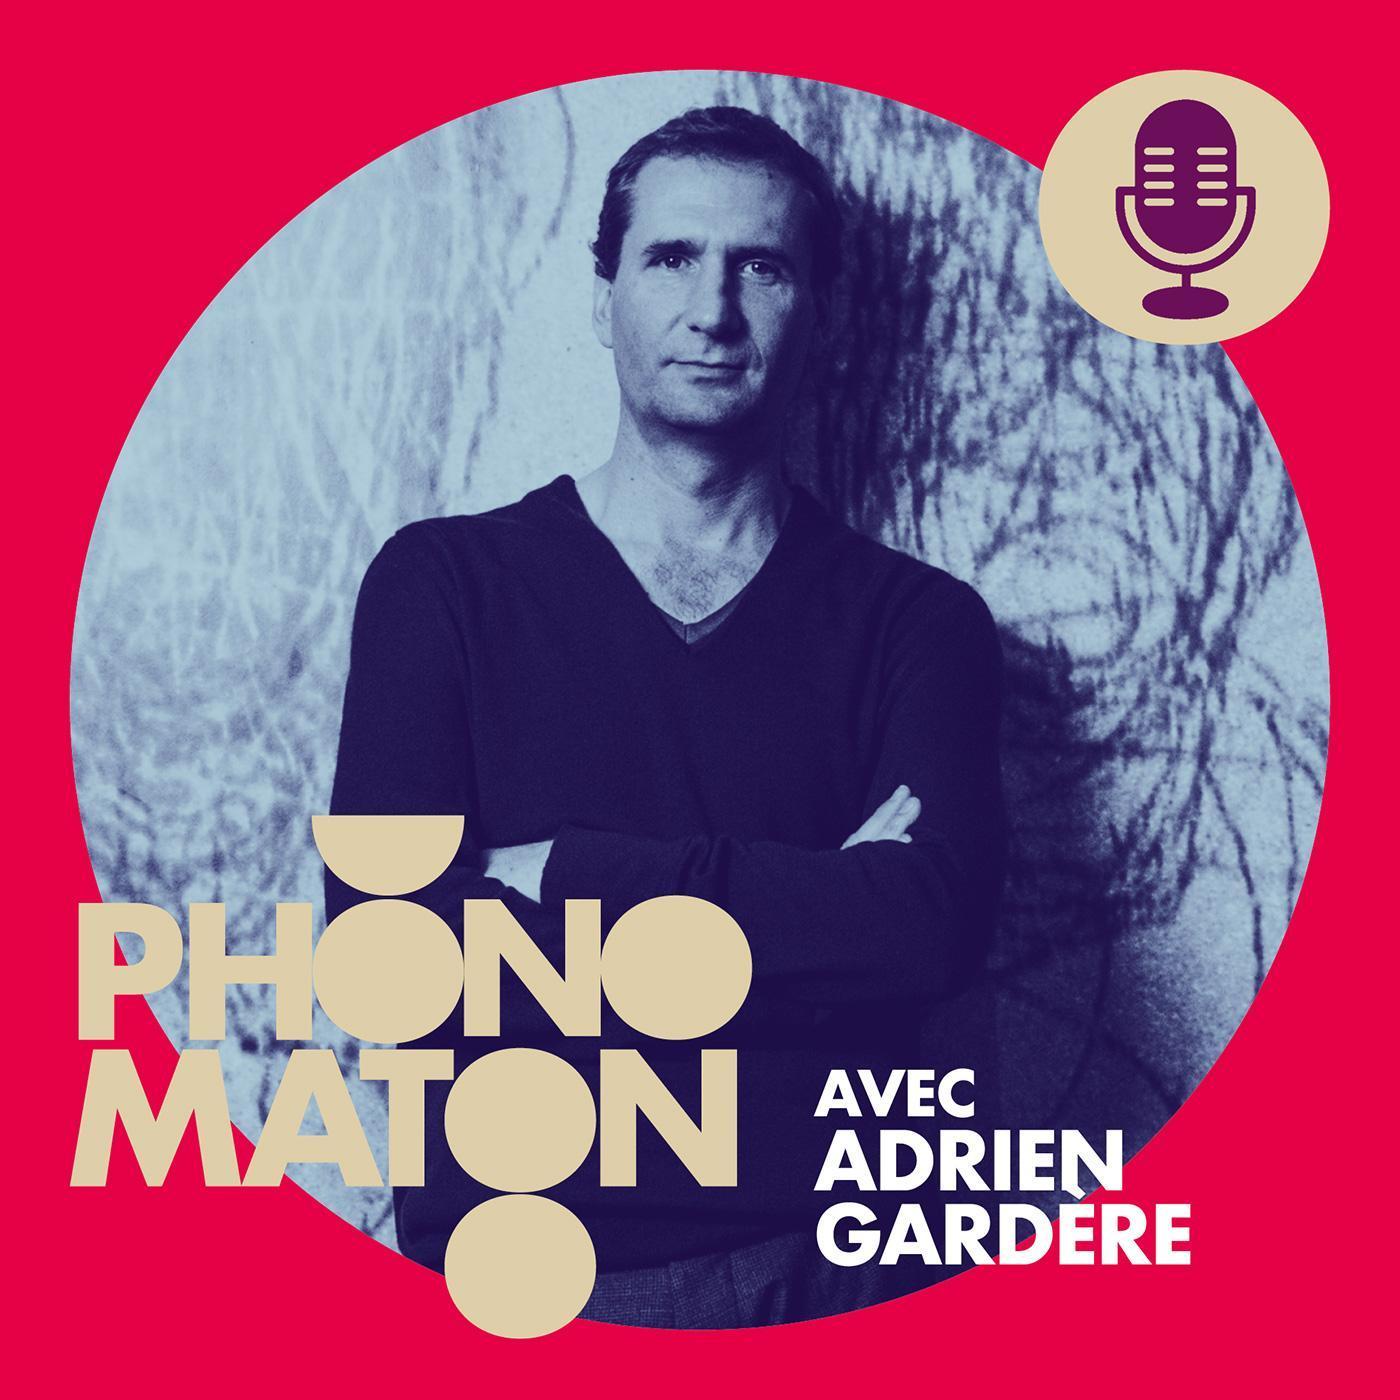 Phonomaton avec Adrien Gardère